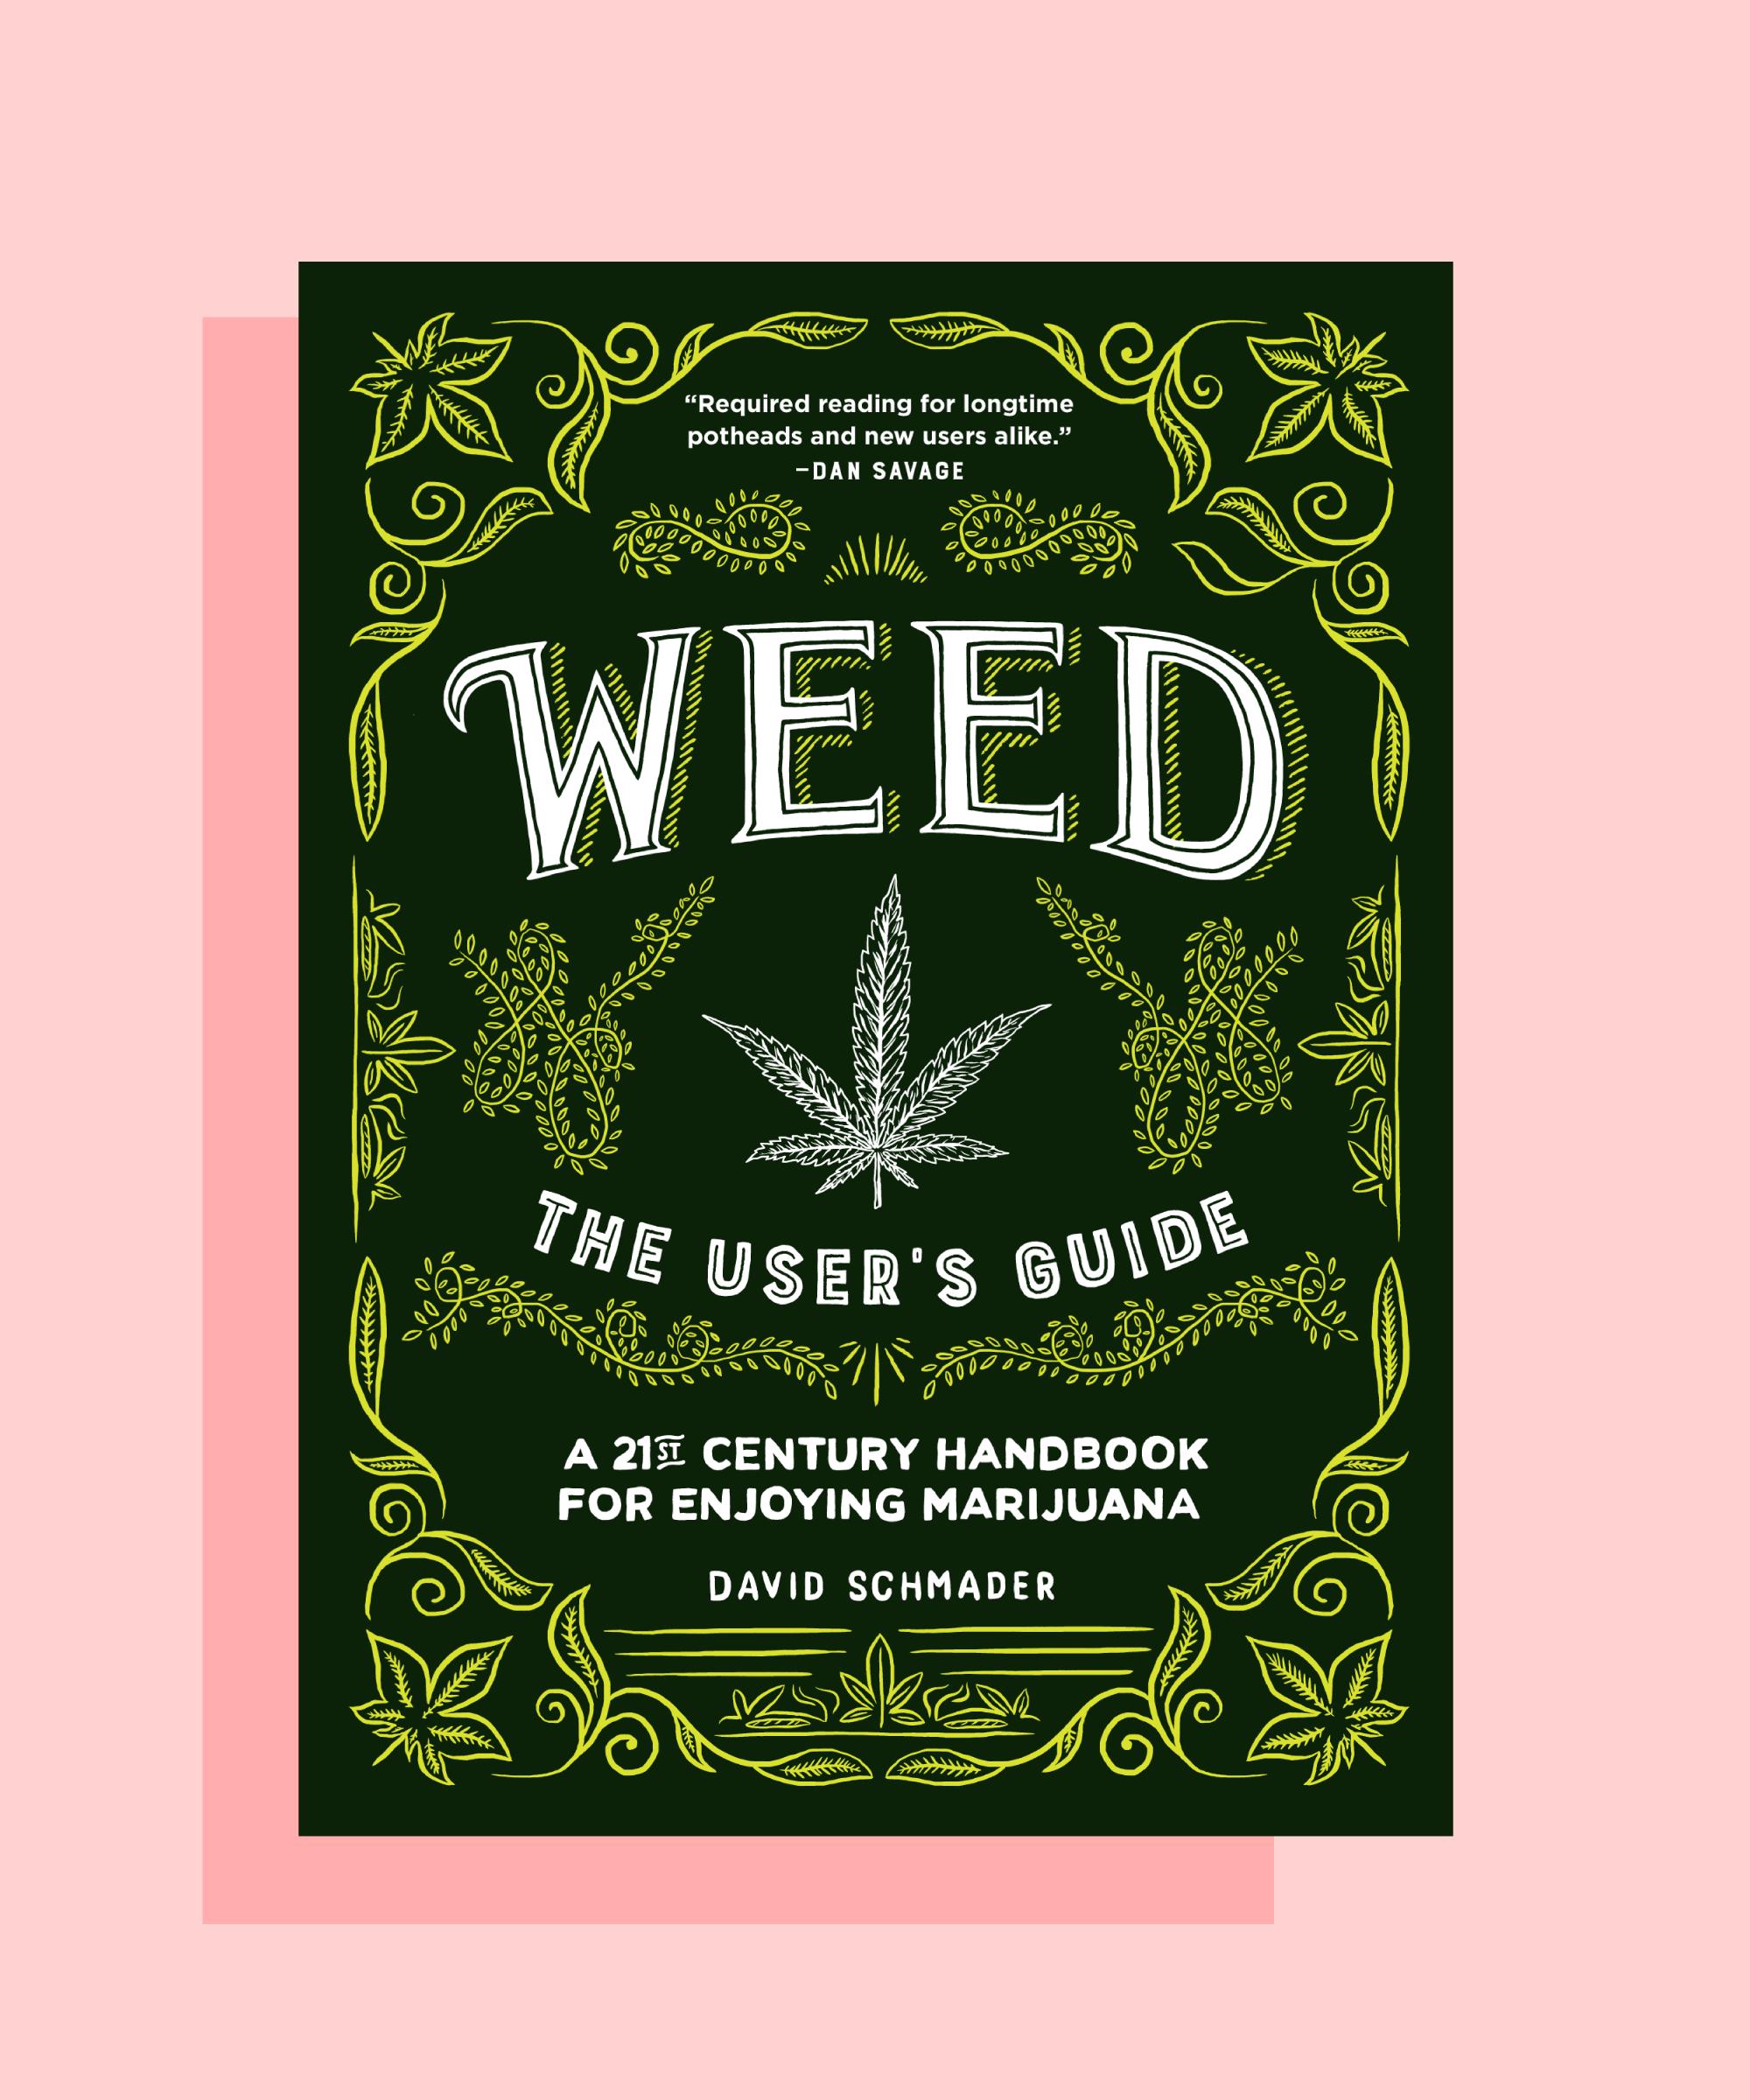 8ae427334f0 Marijuana Paranoia - How To Calm Down If So High On Pot